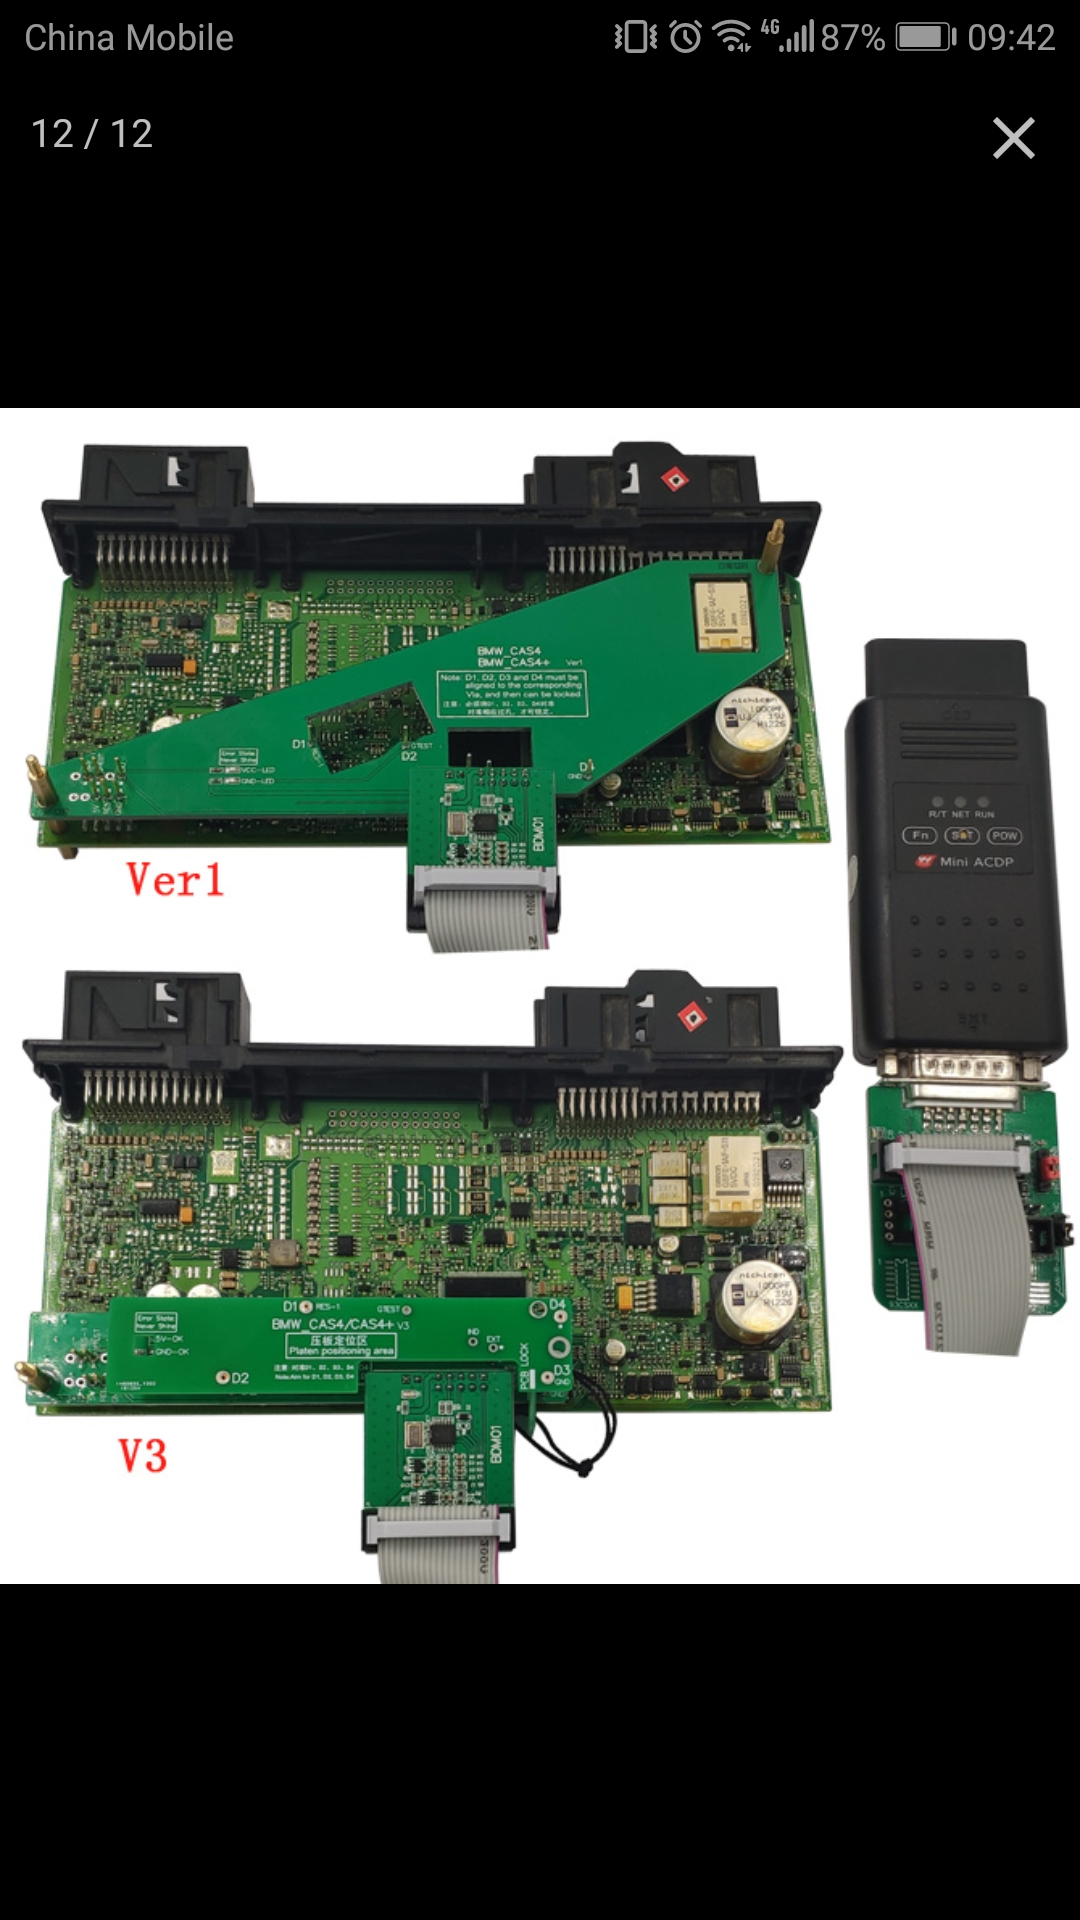 acdp-mini-bmw-cas4-newest-wiring-diagram-05